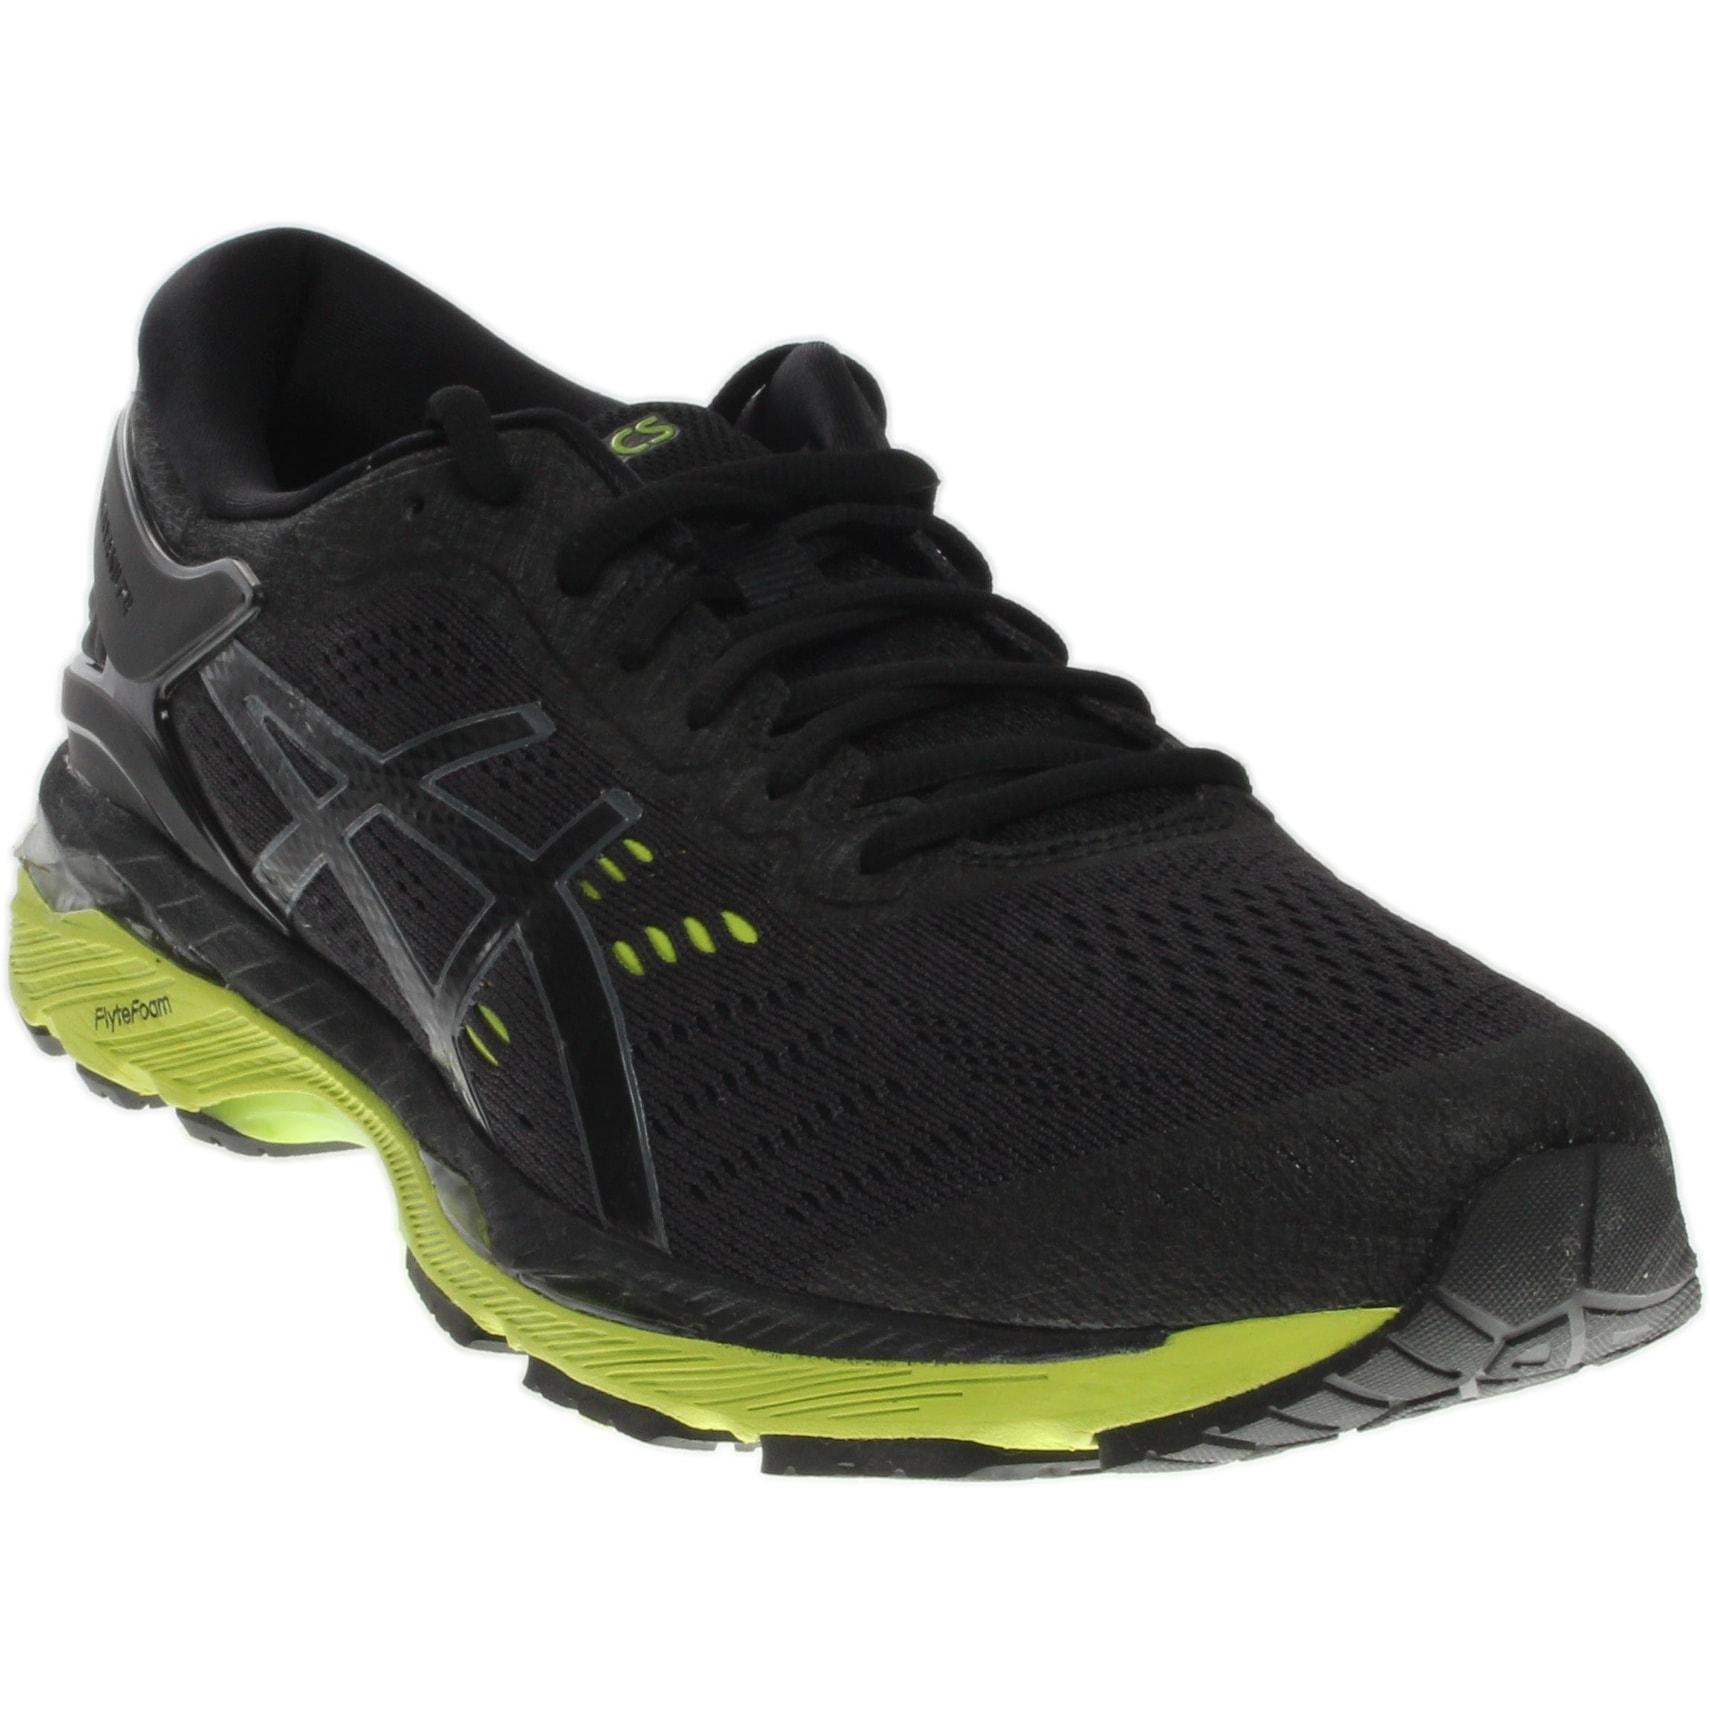 Asics Mens Gel Kayano 24 Running Athletic Shoes